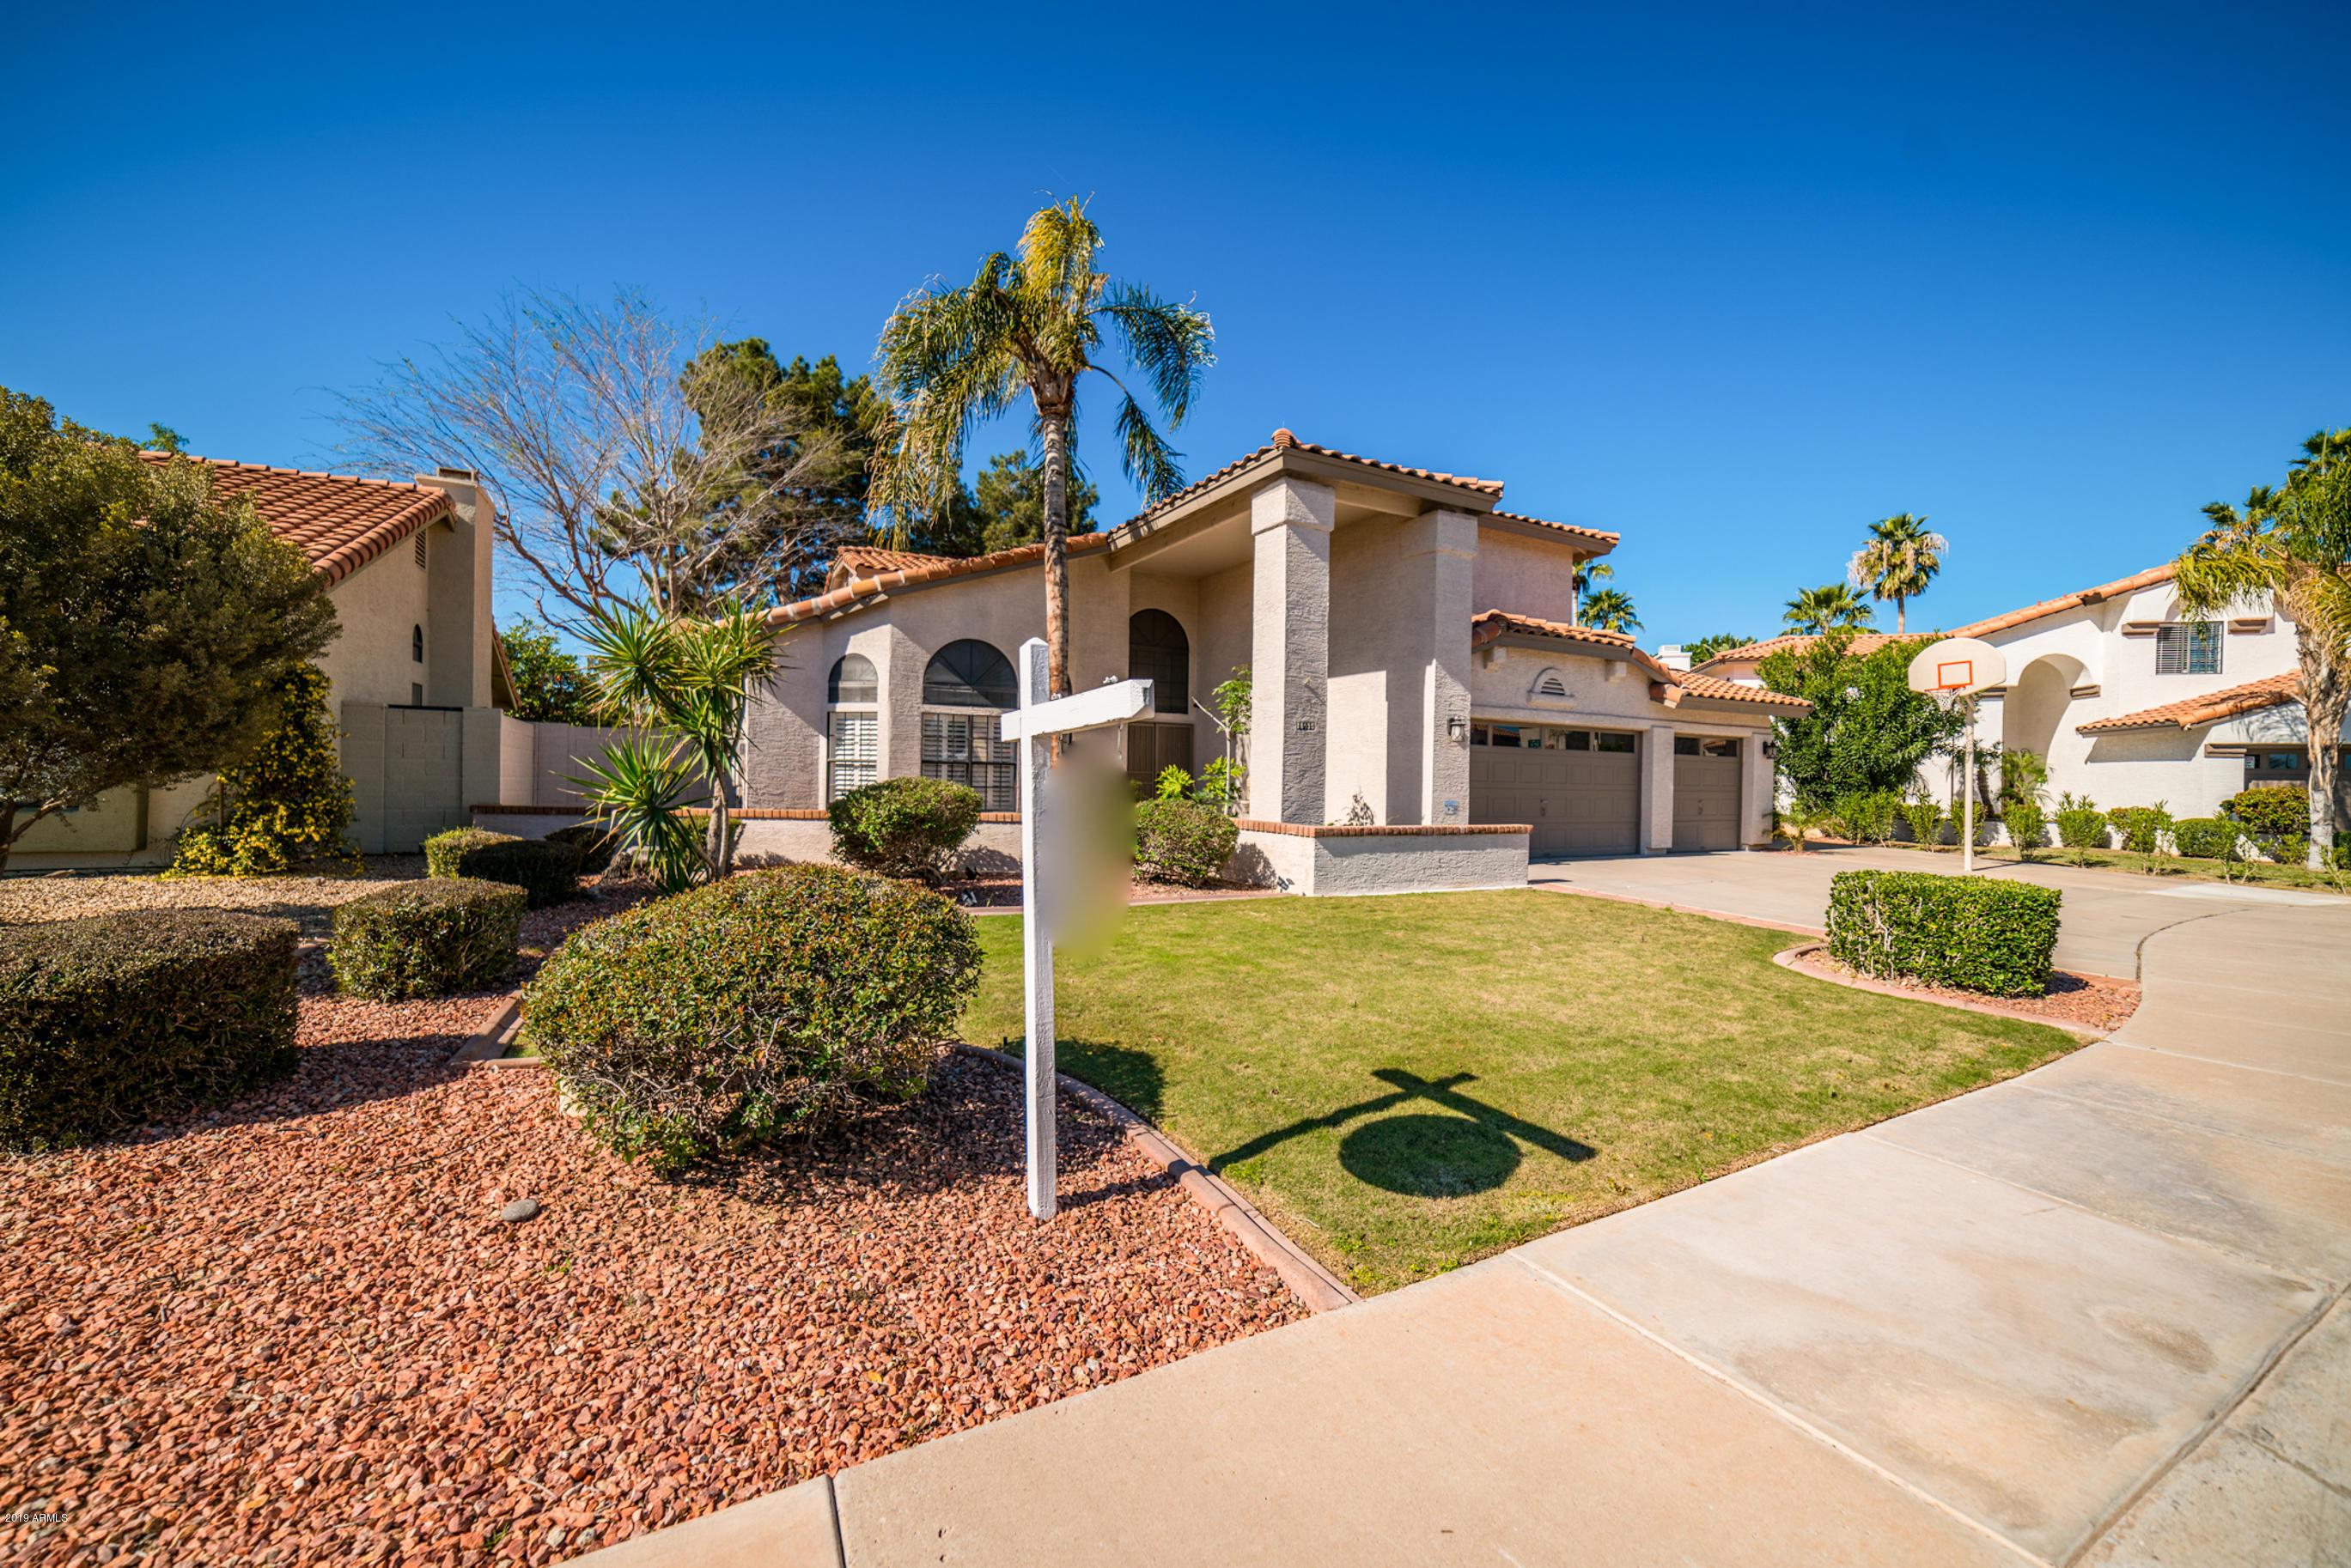 Photo of 10935 W ASHBROOK Place, Avondale, AZ 85392